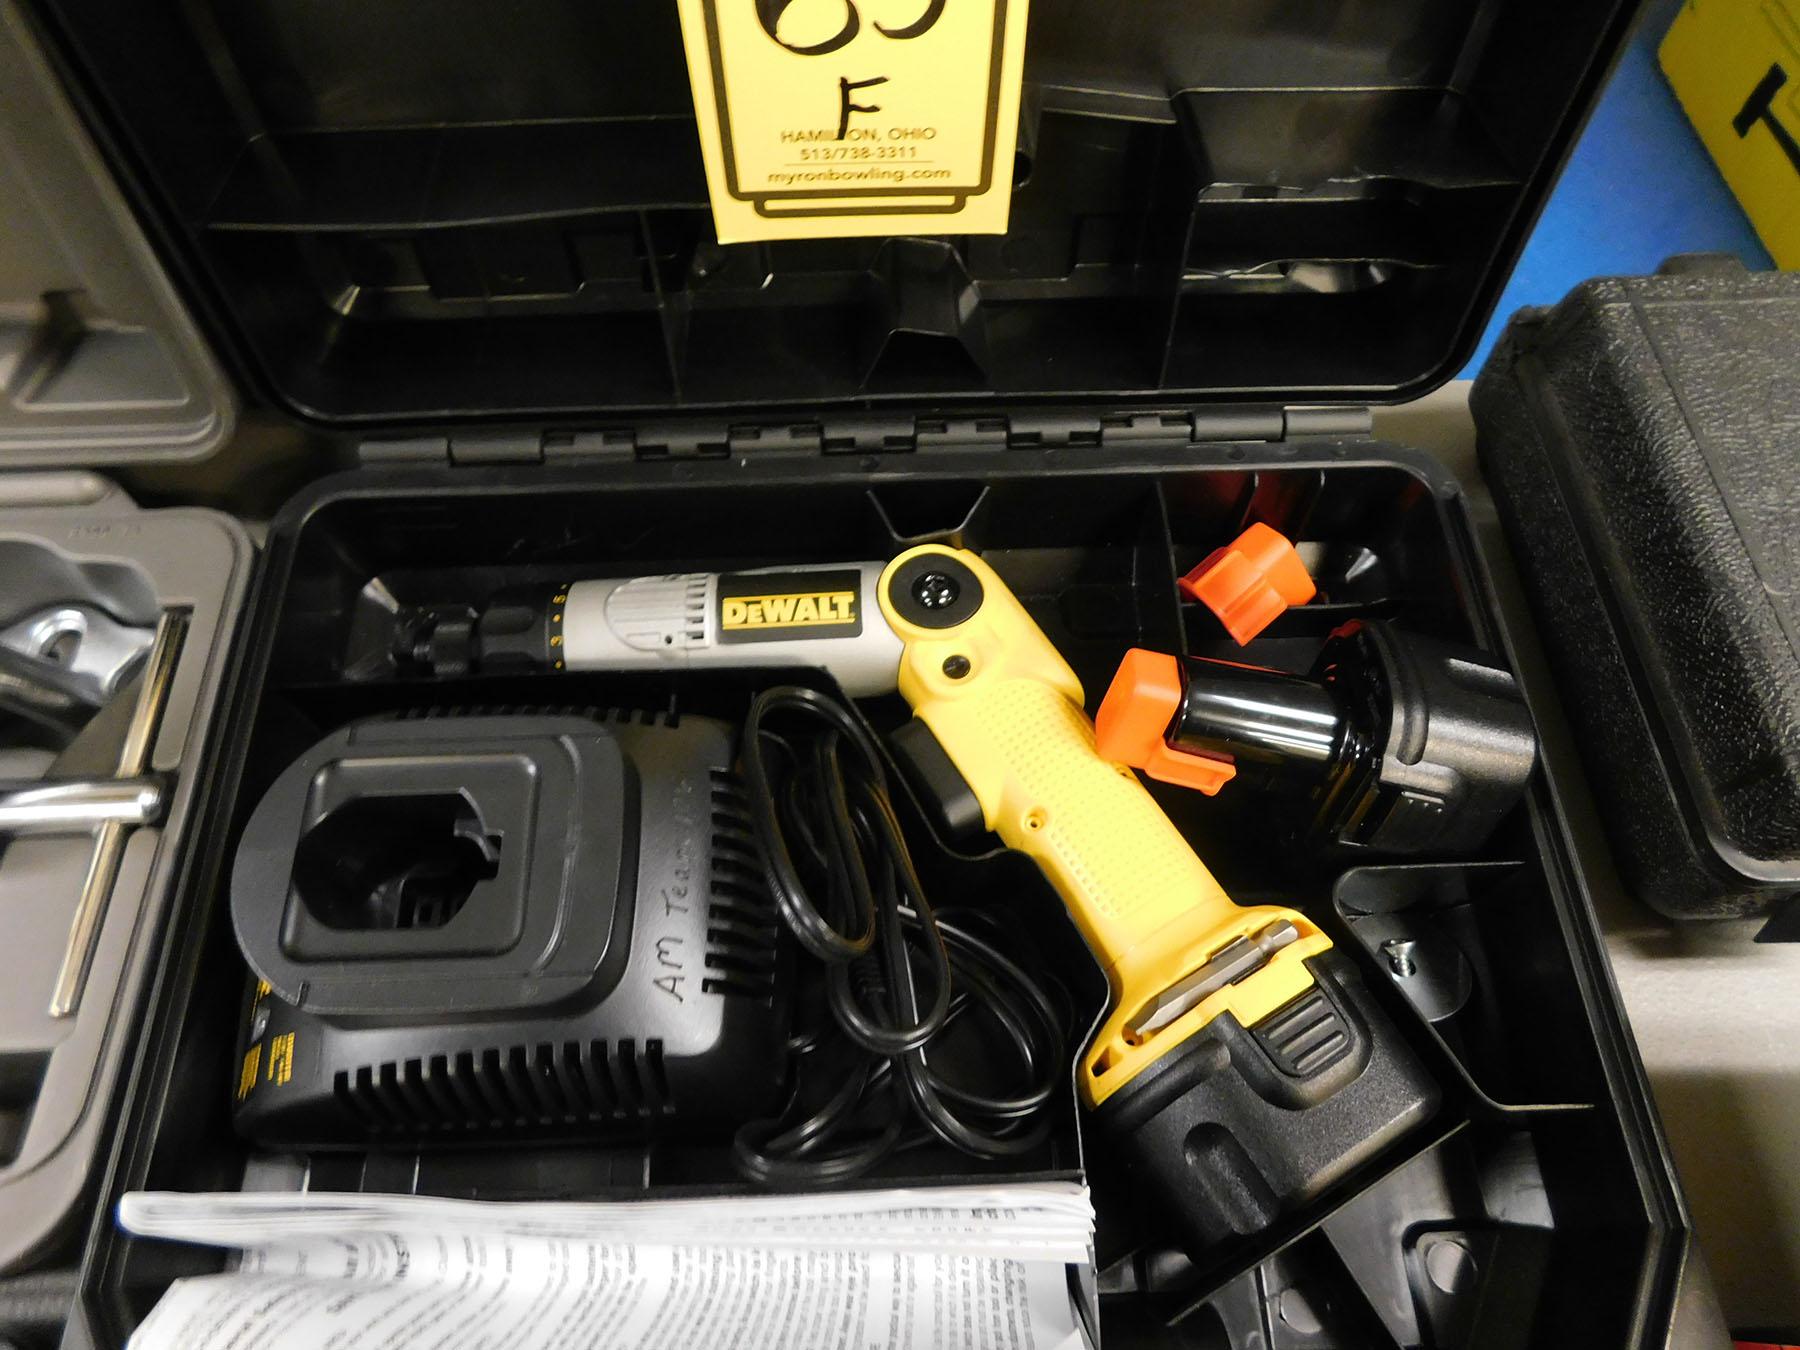 Lot 65F - DEWALT 7.2V CORDLESS SCREW DRIVER